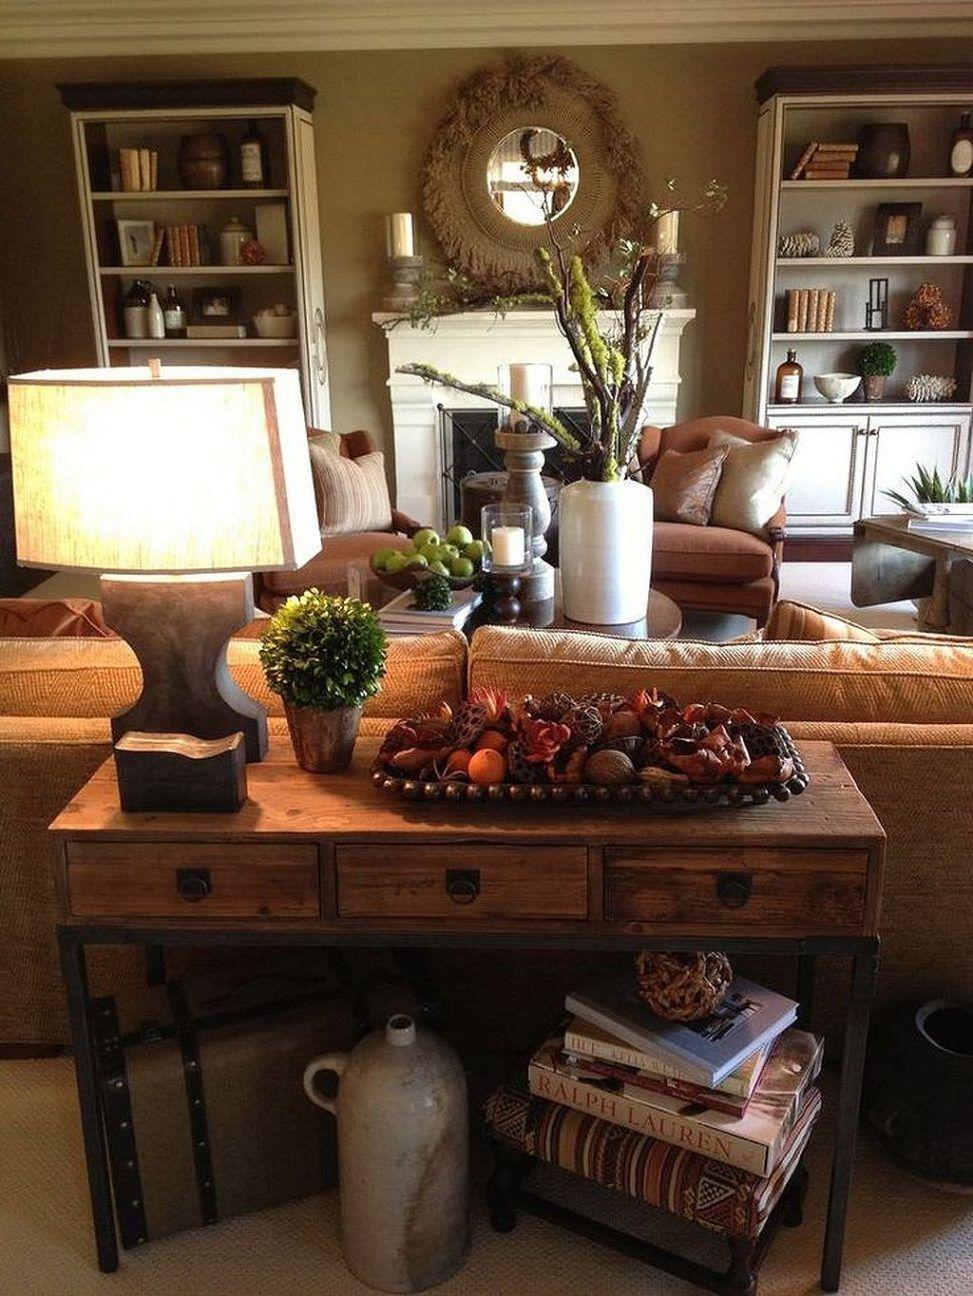 Diy Farmhouse Living Room Decorating Ideas 49 Homedecor